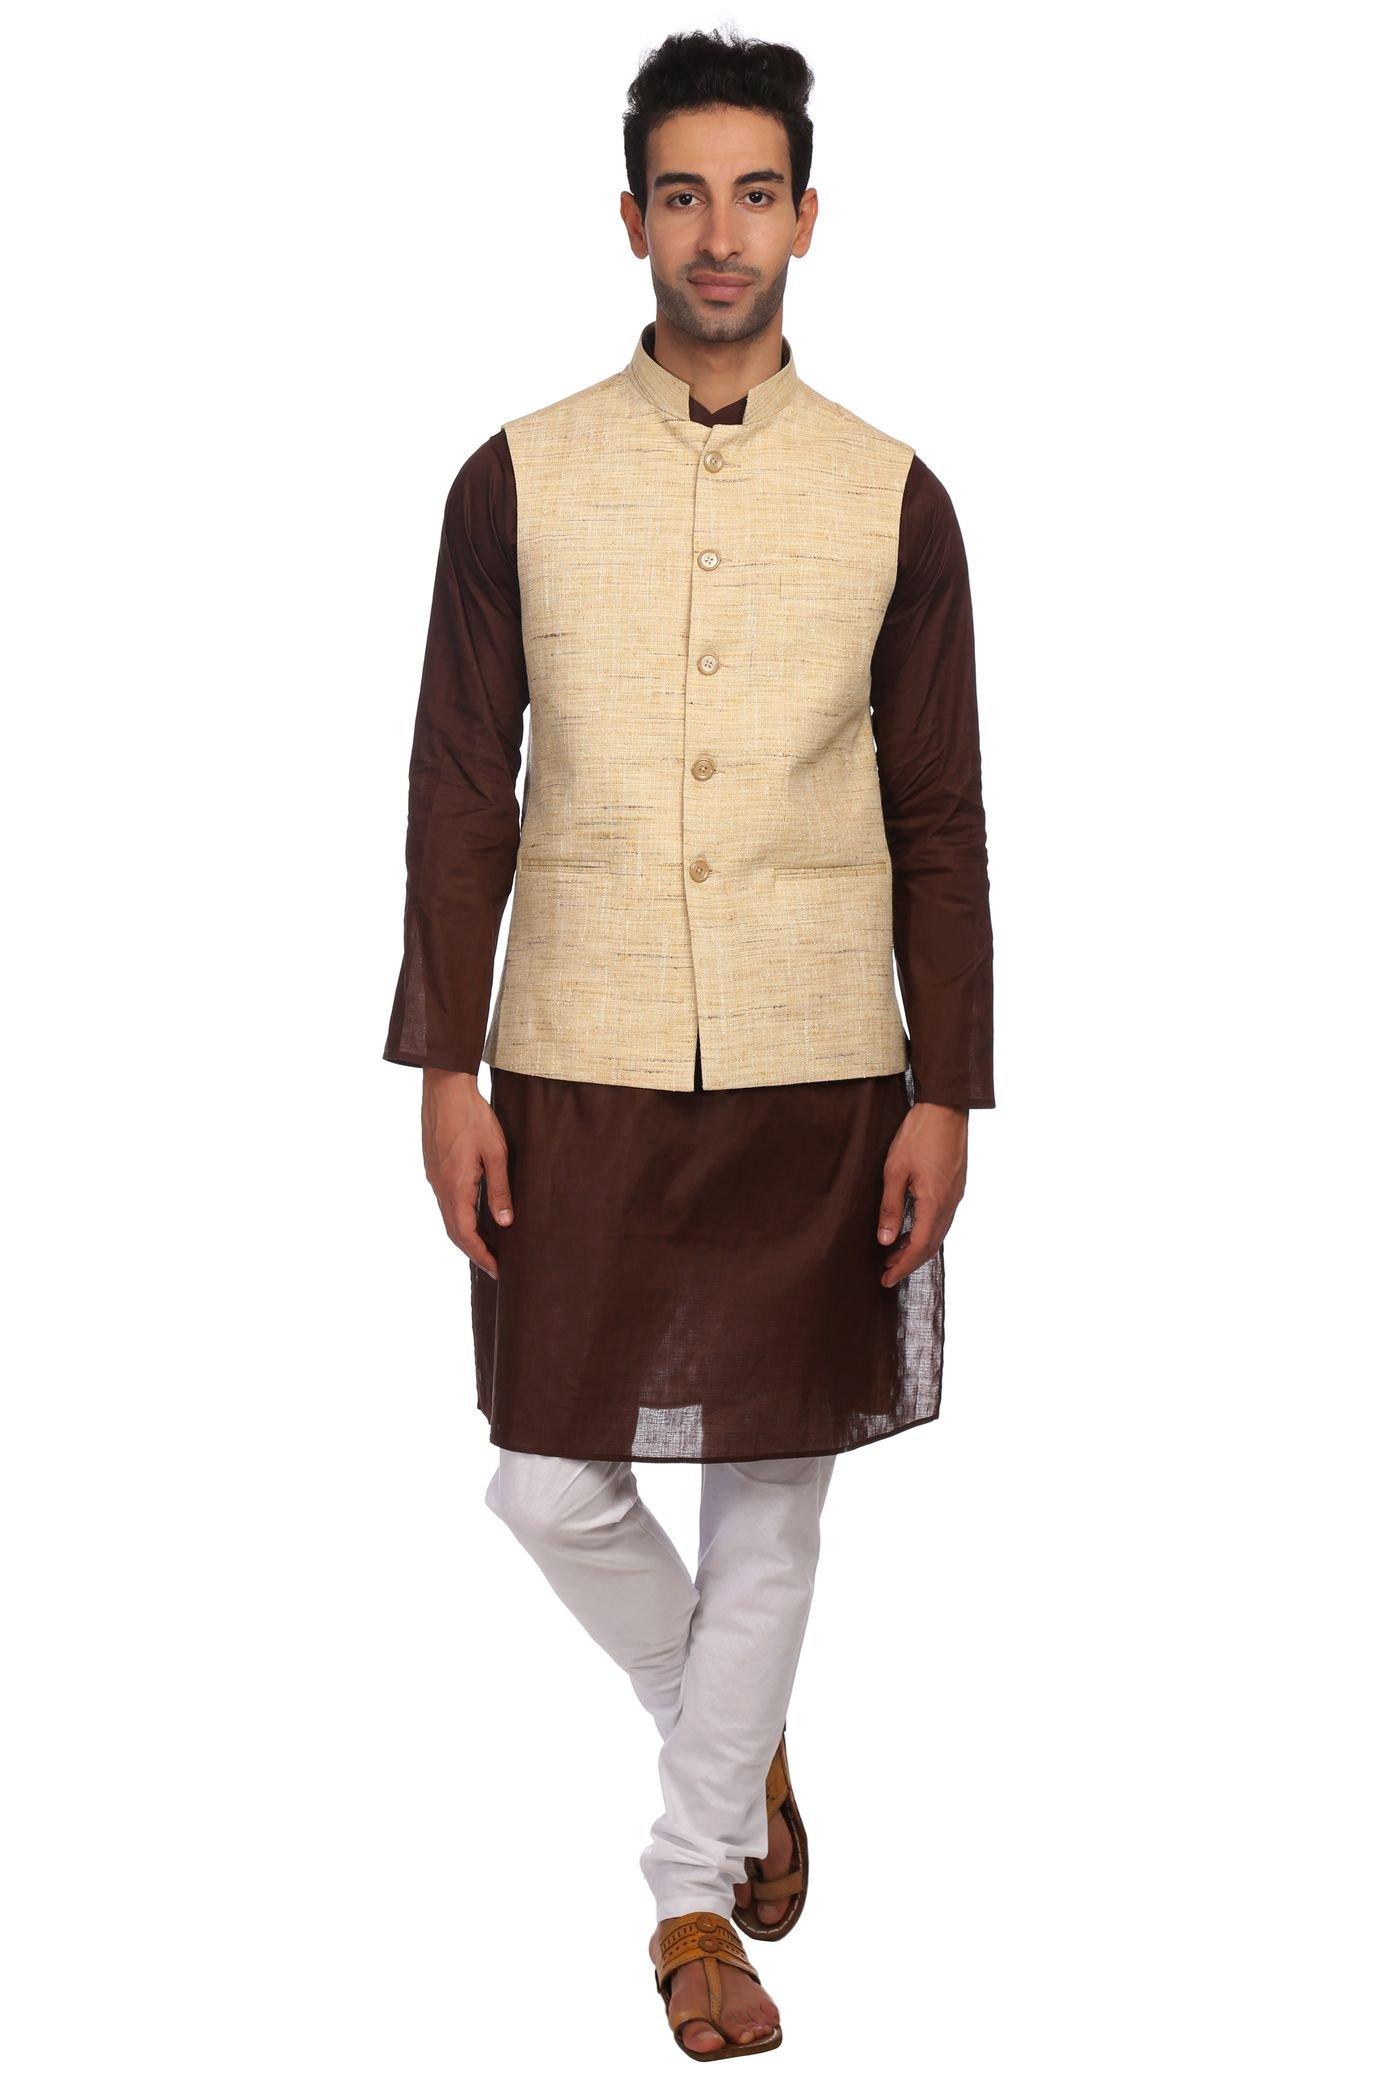 WINTAGE Men's KhadiBeige Nehru Jacket Waistcoat and 100% Cotton Brown Kurta Pajama Indian Ethnic Set : Small by WINTAGE